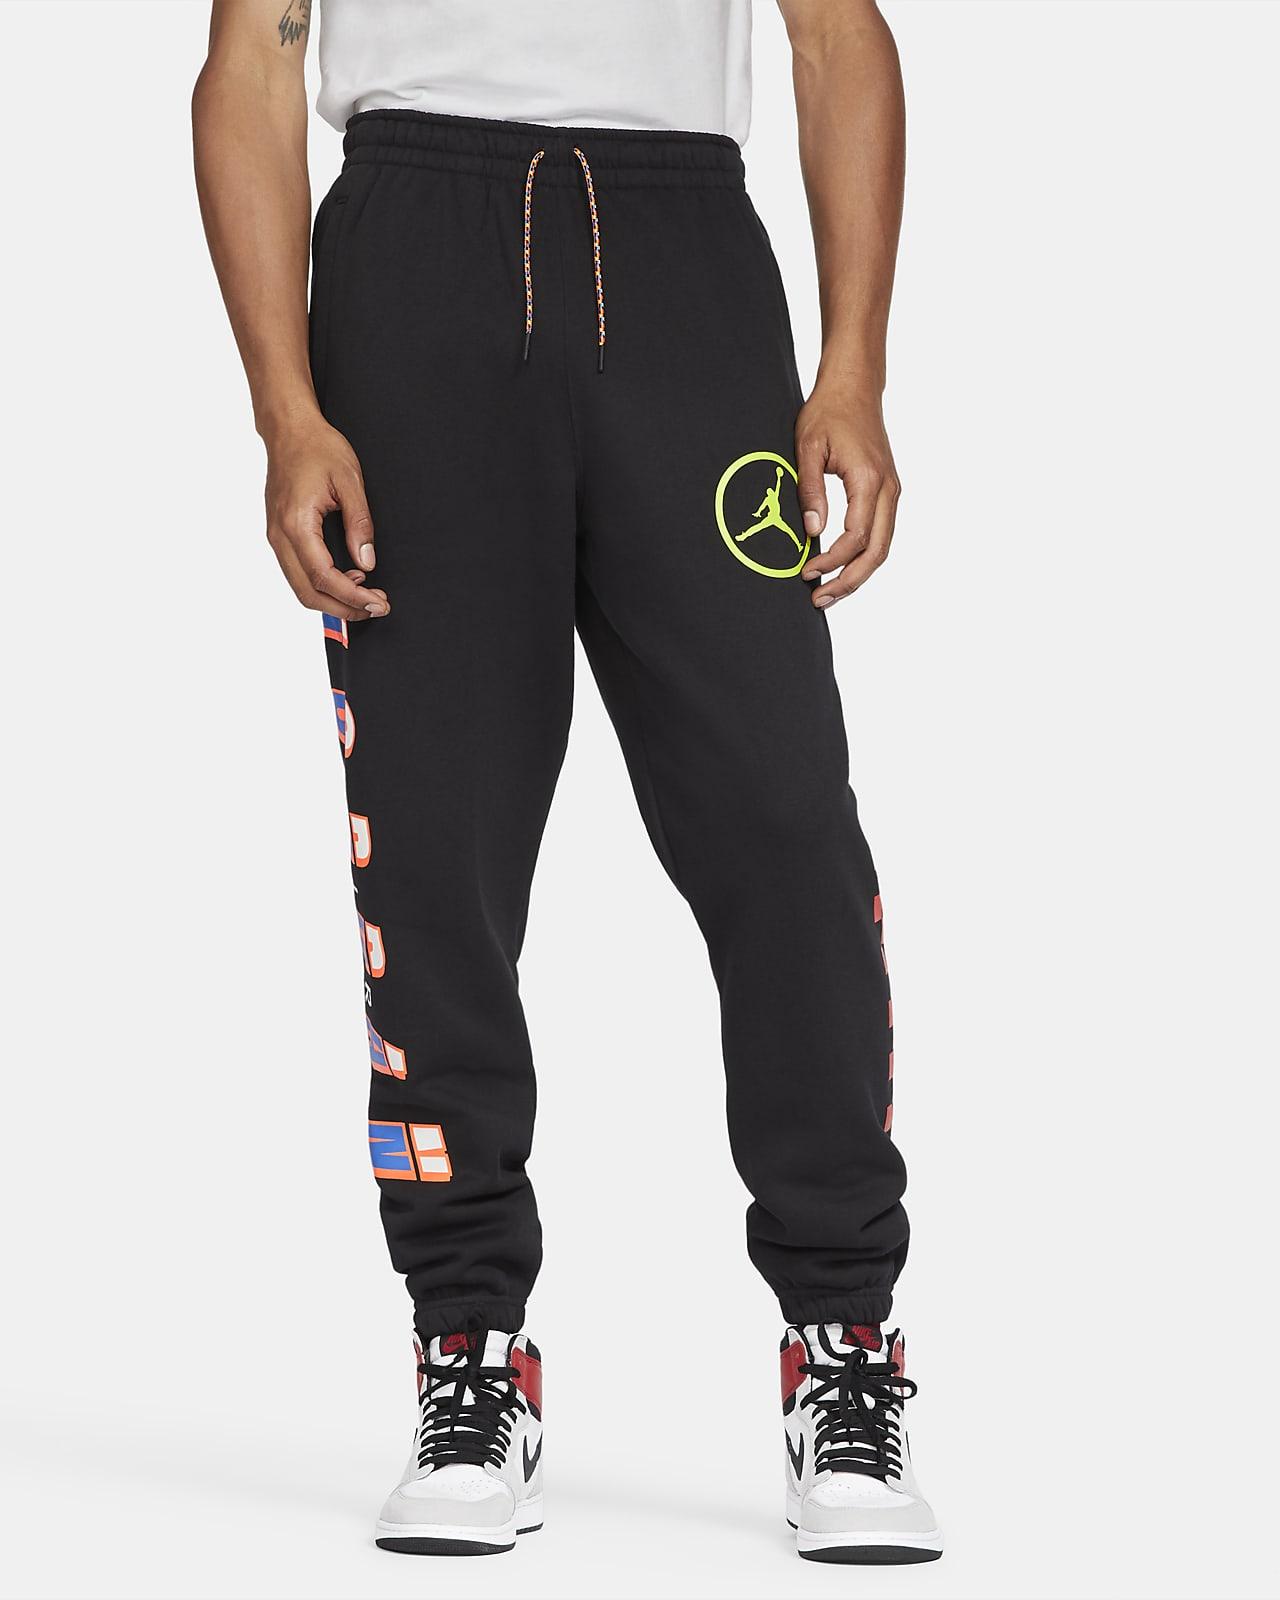 Pantalones de tejido Fleece para hombre Jordan Sport DNA